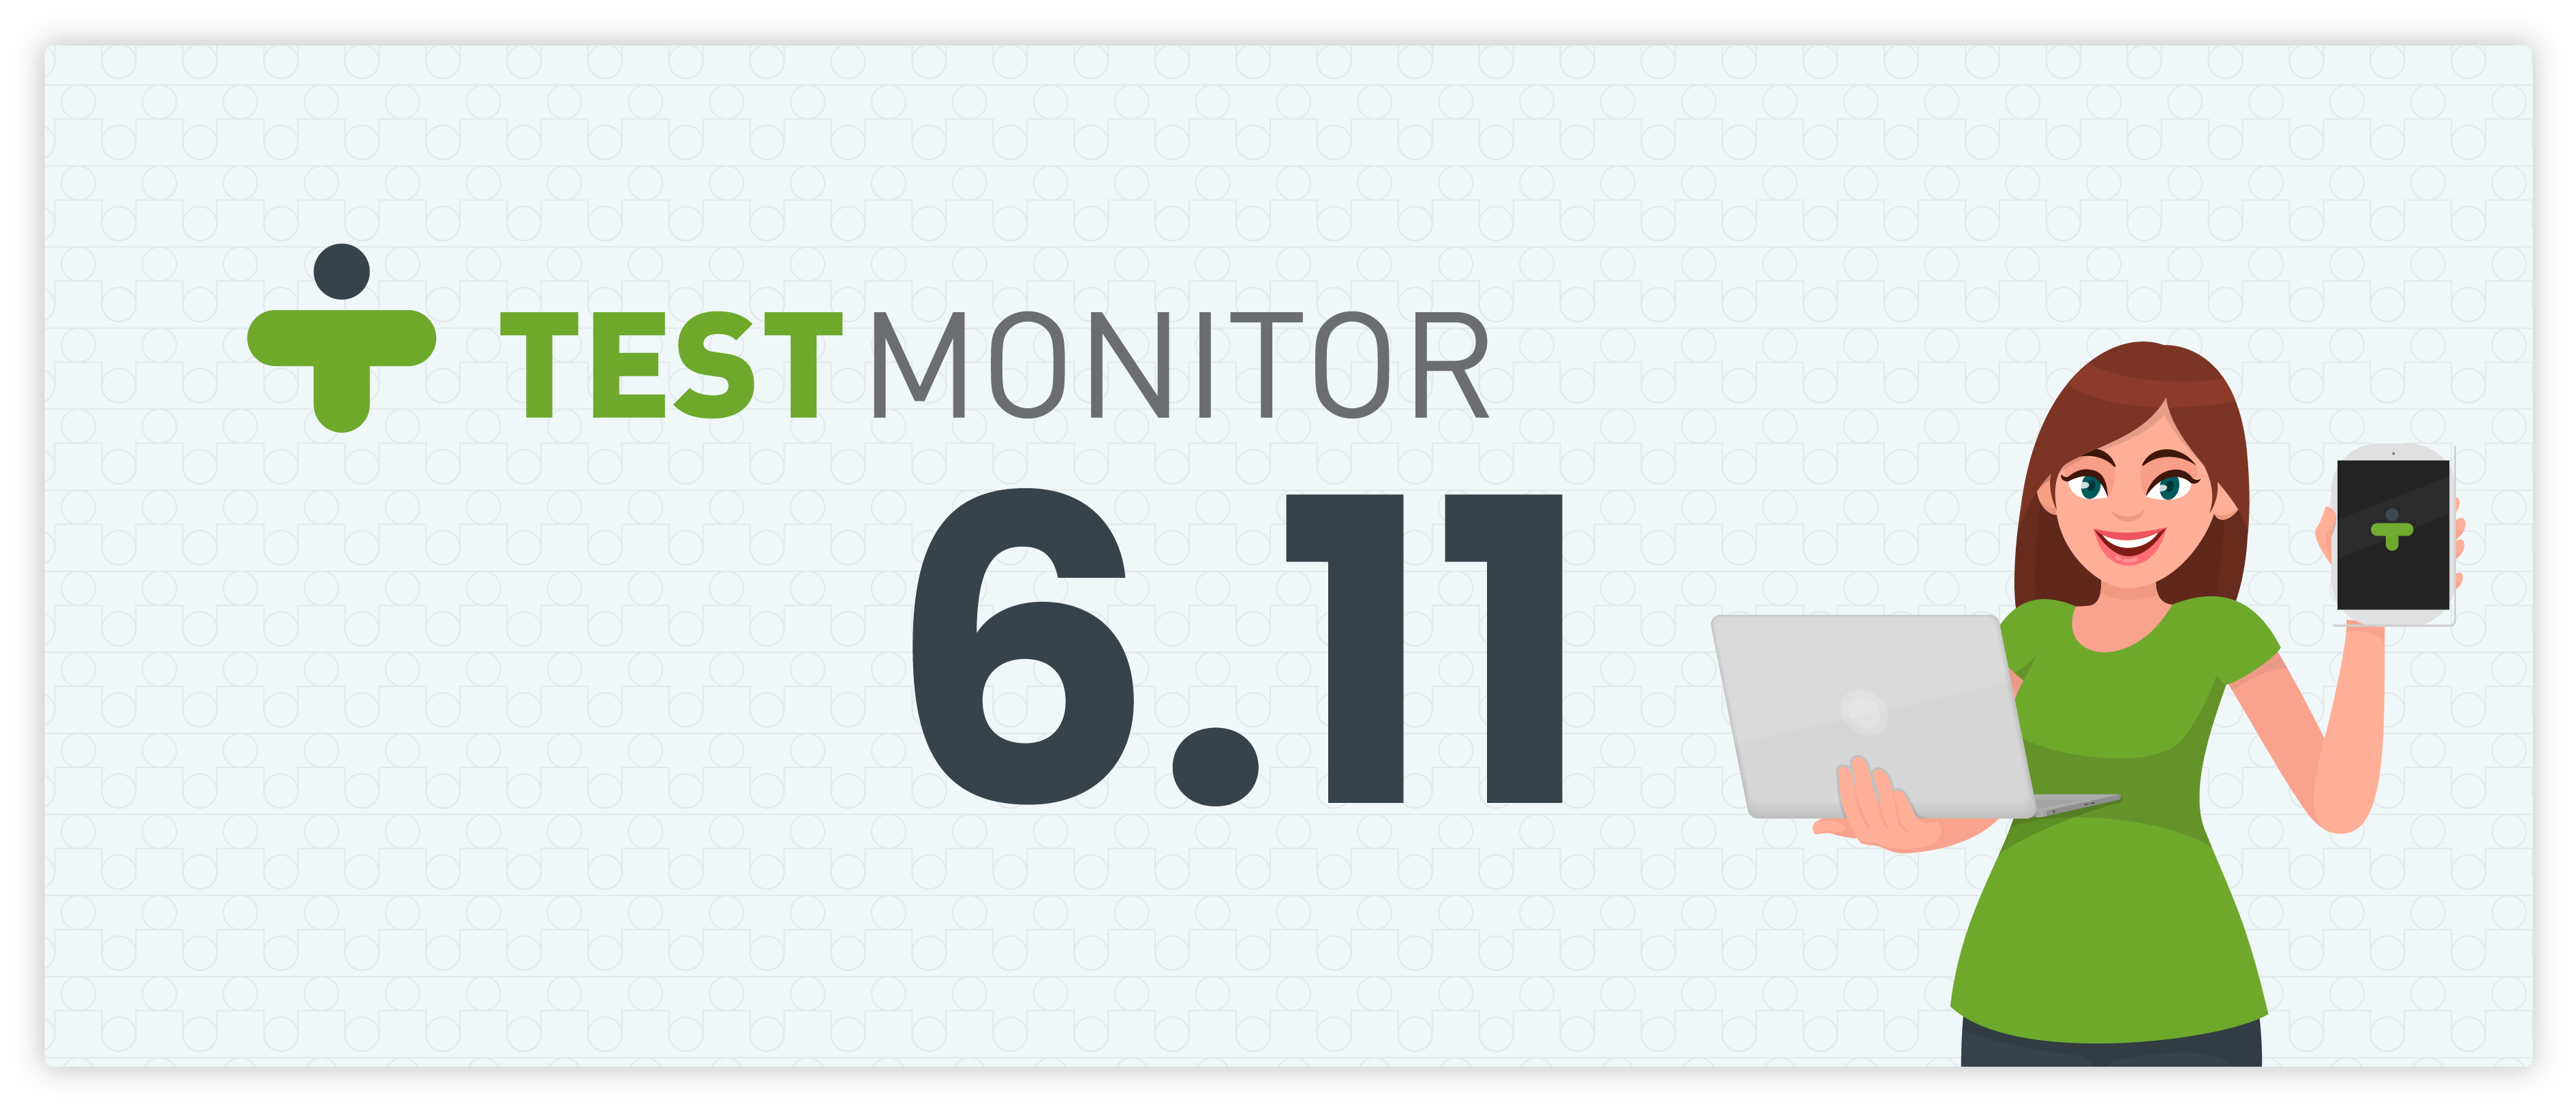 Introducing TestMonitor 6.11